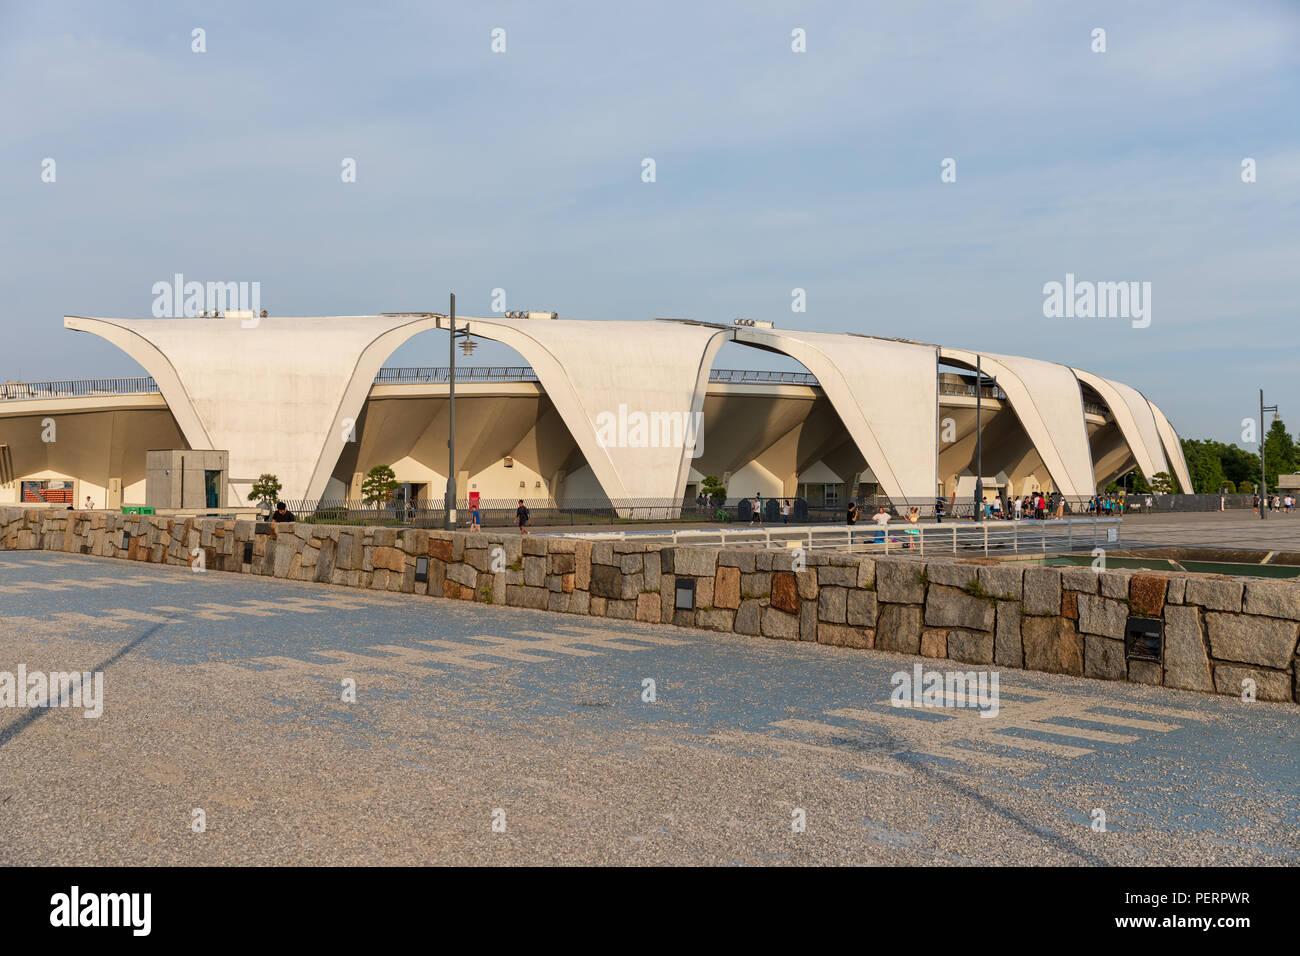 Komazawa Olympic Park Stadium (Murata Masachika Architects), built for the 1964 Summer Olympics in Tokyo, Japan - Stock Image